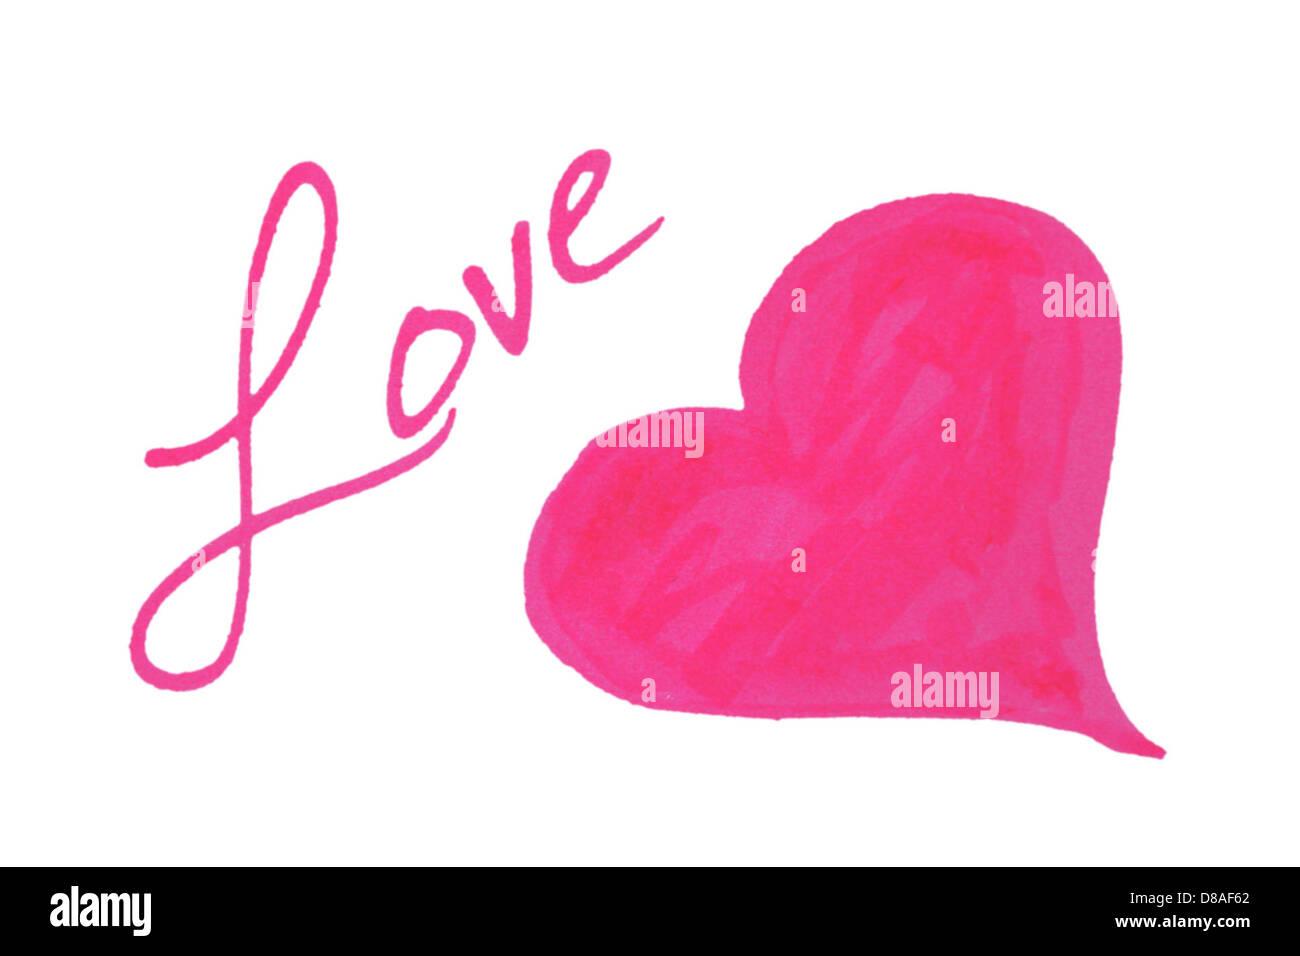 Amor corazón clip art. Imagen De Stock